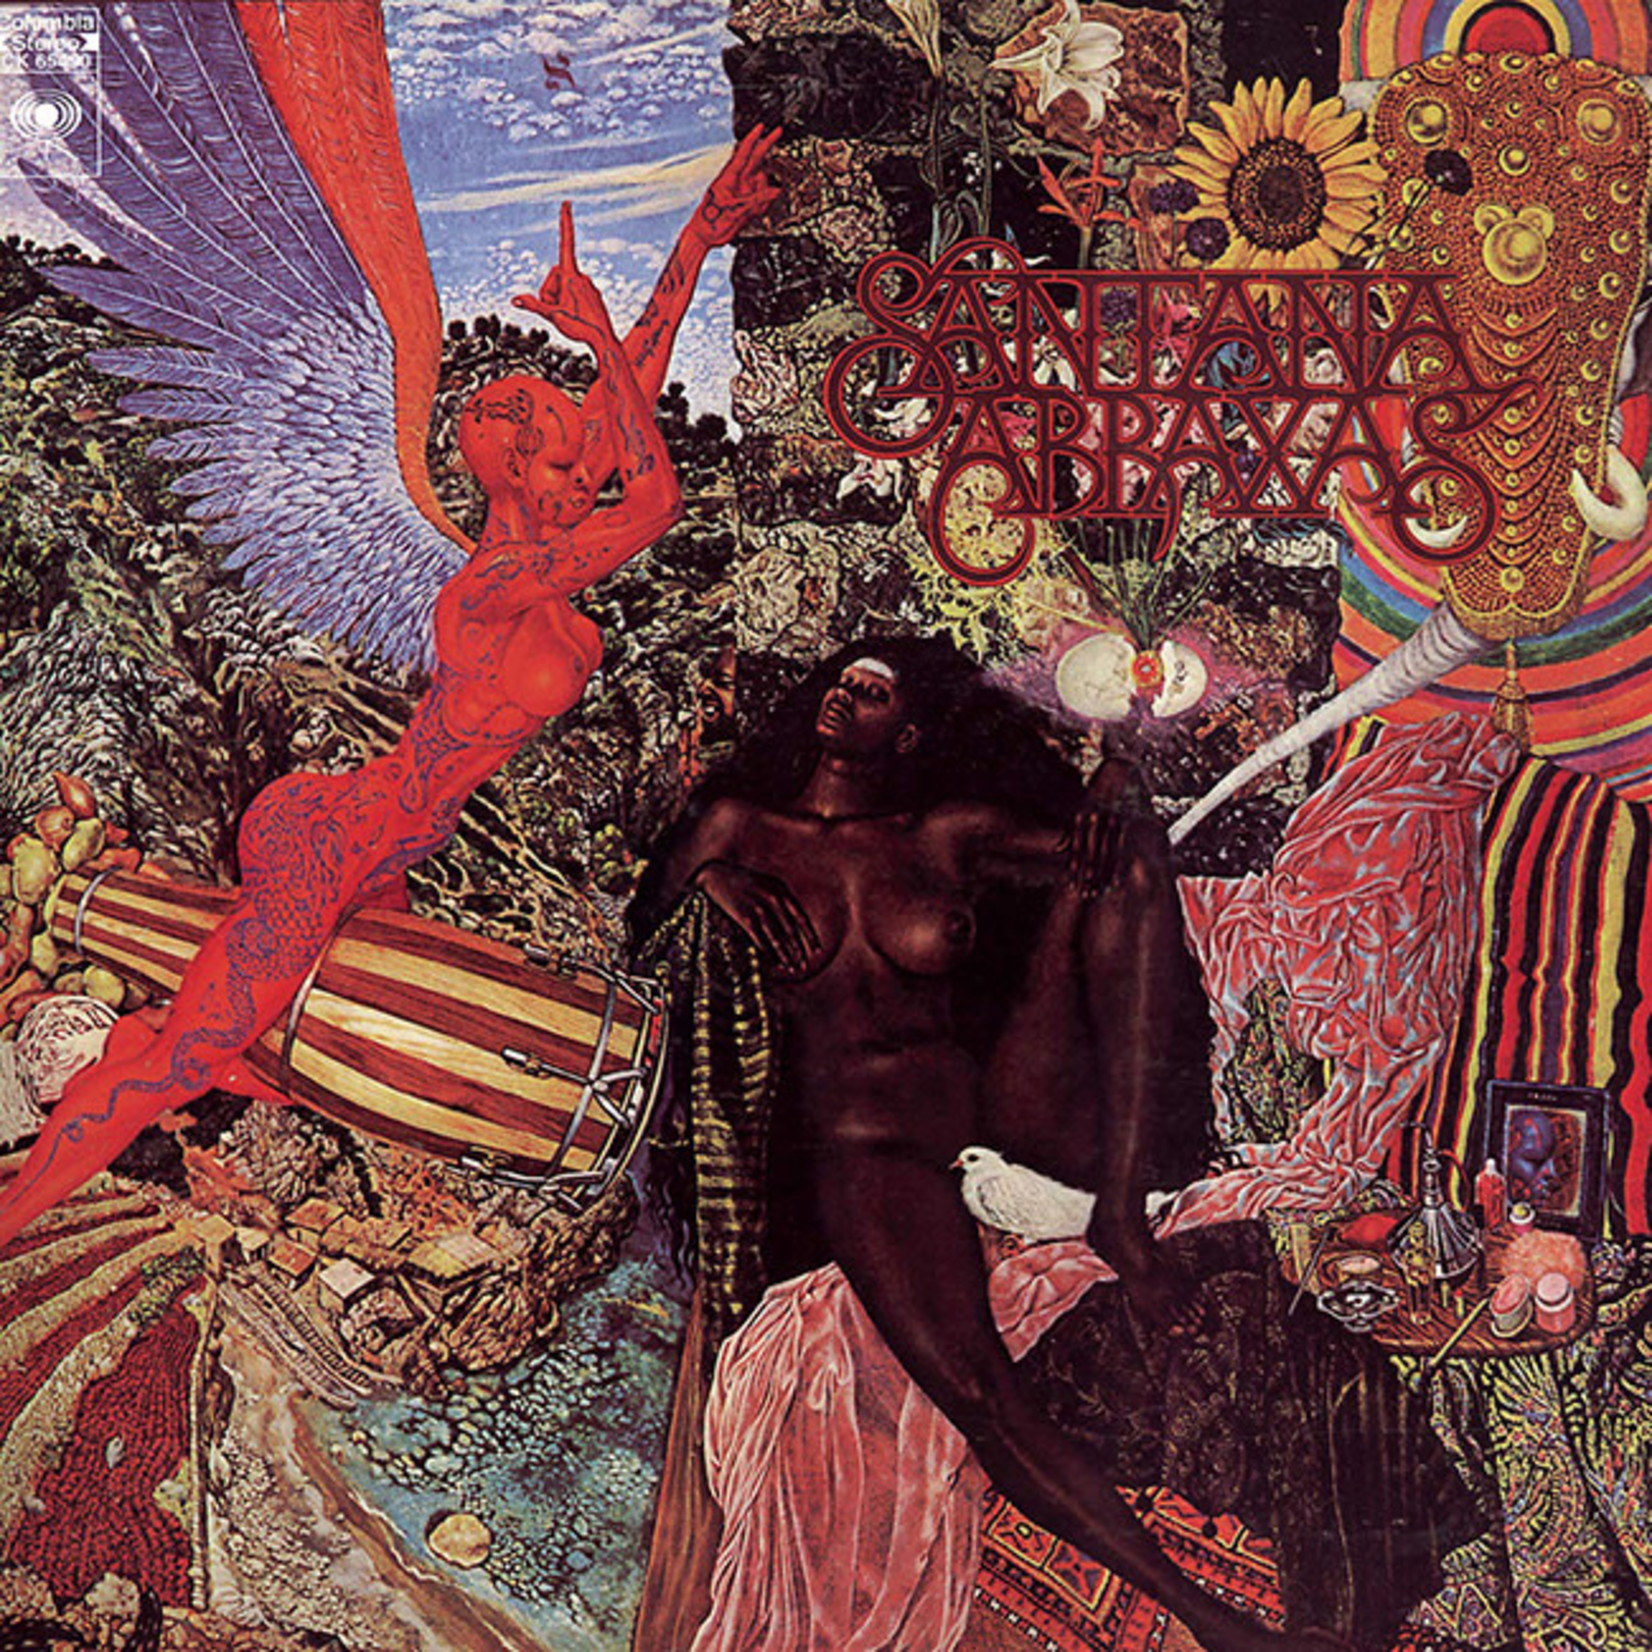 [New] Santana: Abraxas